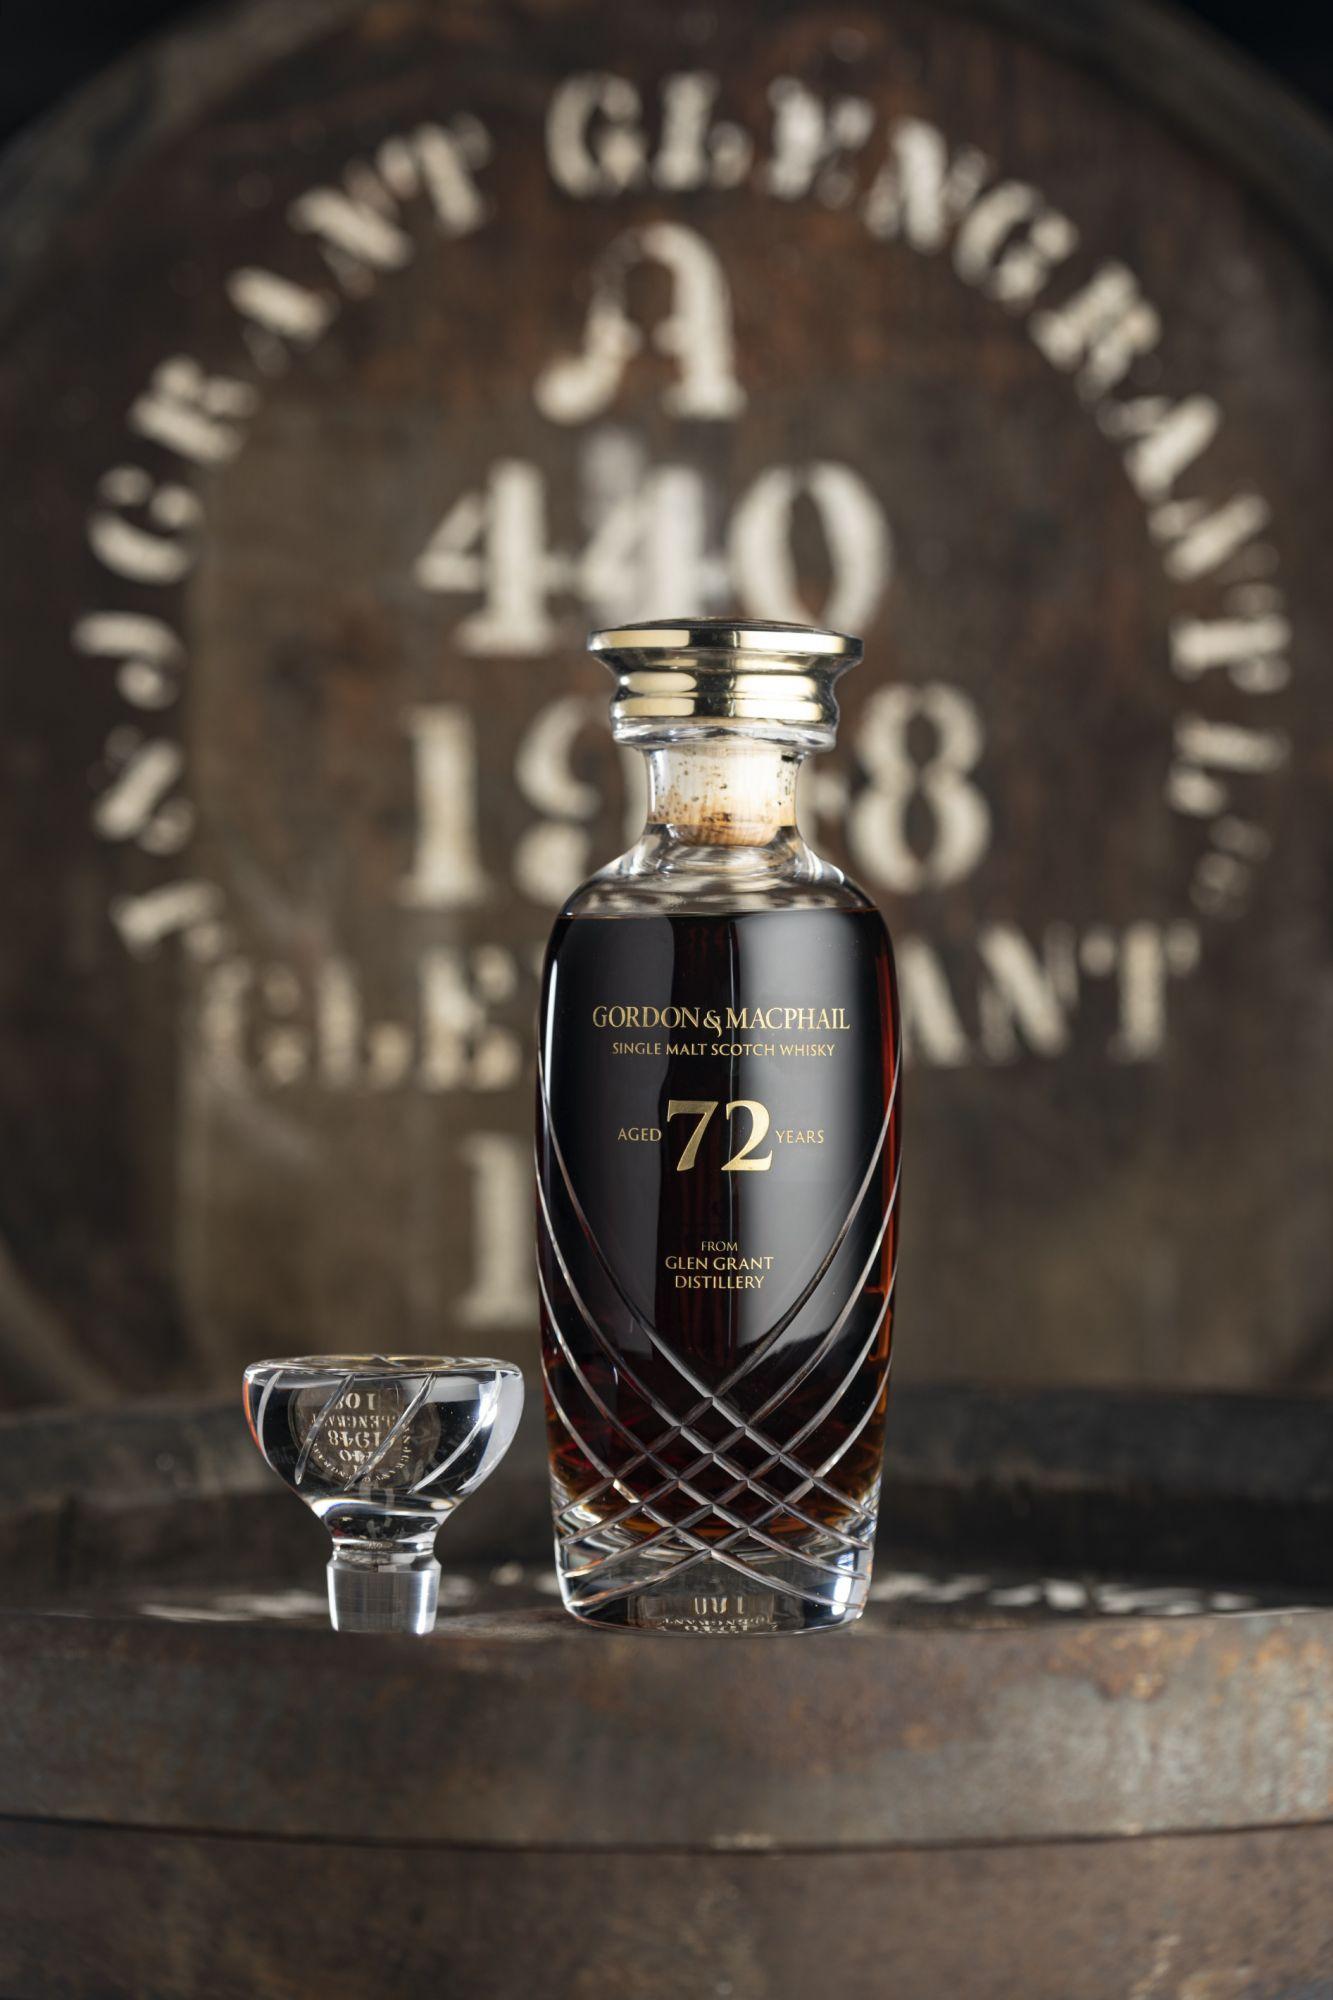 Historical Gordon & MacPhail Single Malt Whisky Makes Its Debut At Bonhams Auction